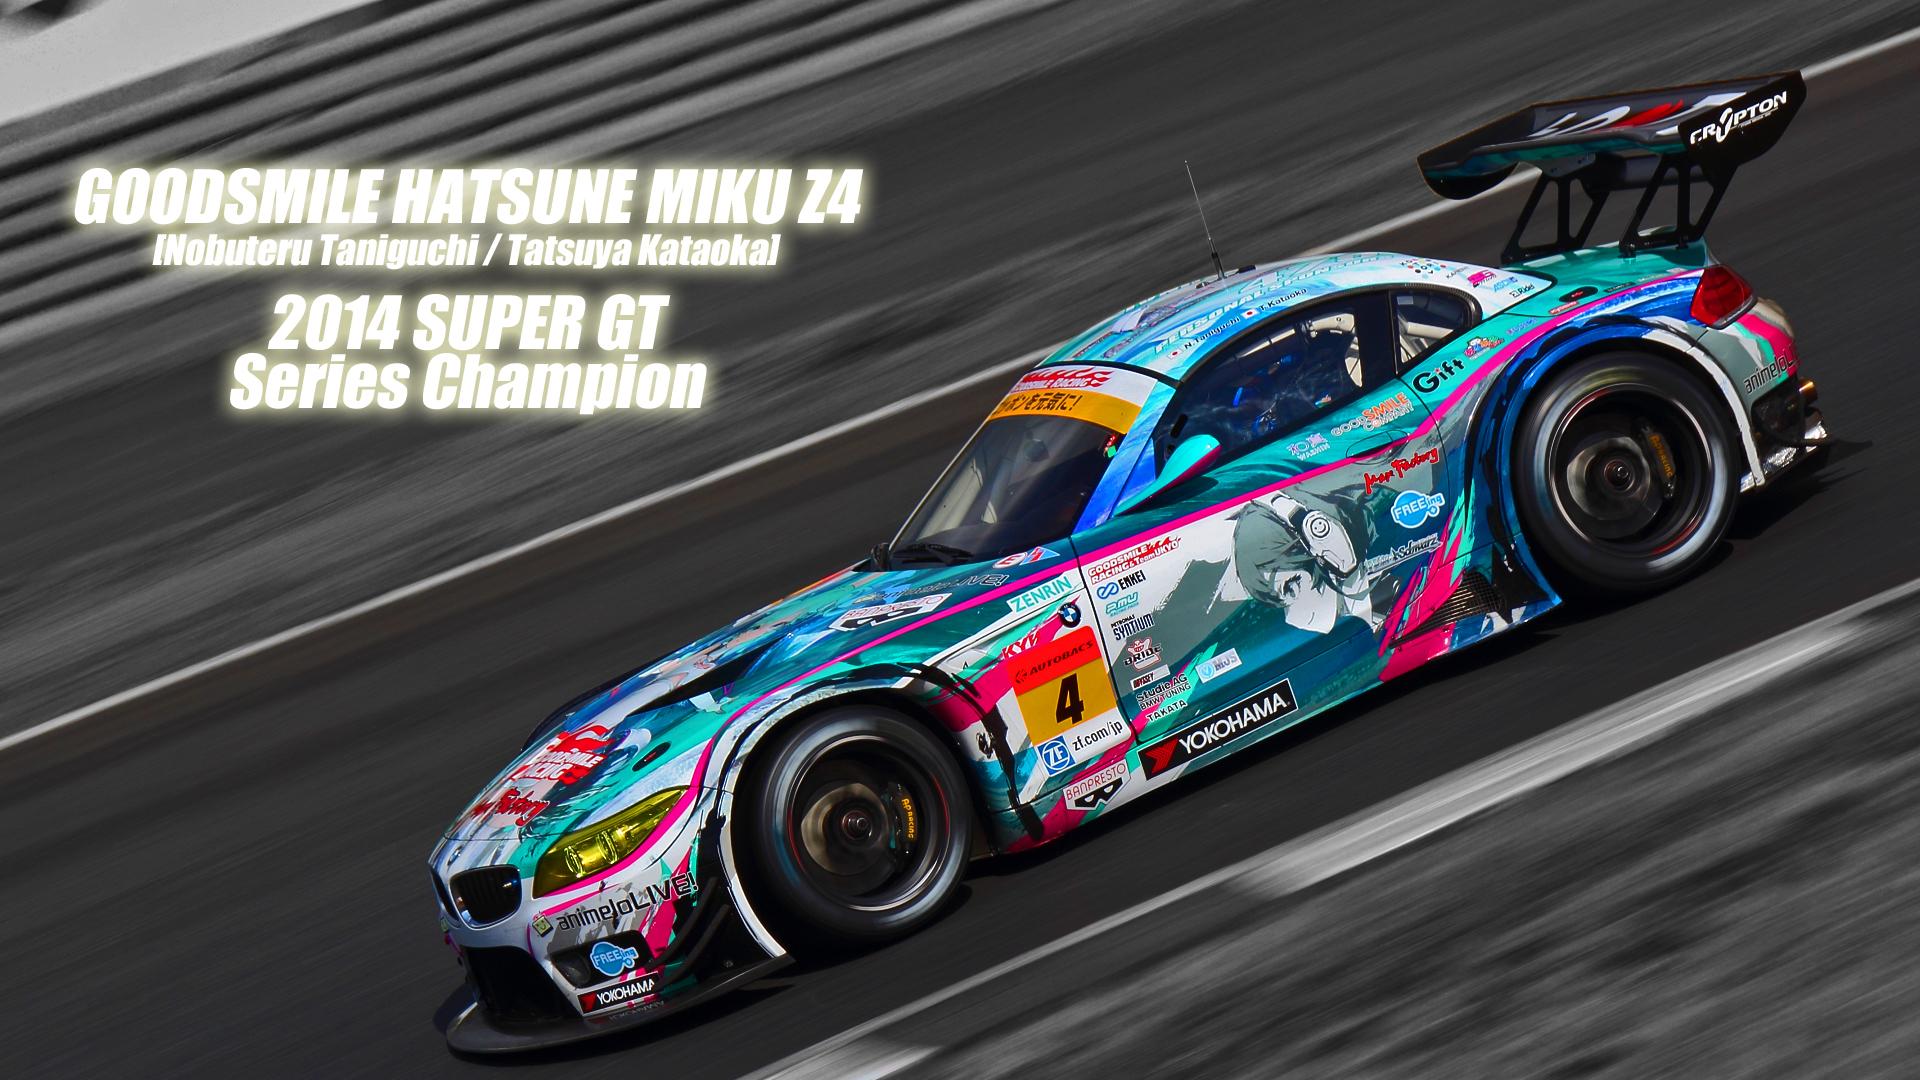 Super Gt 第8戦 Motegi Gt 250km Race:決勝 Challenging Spirit